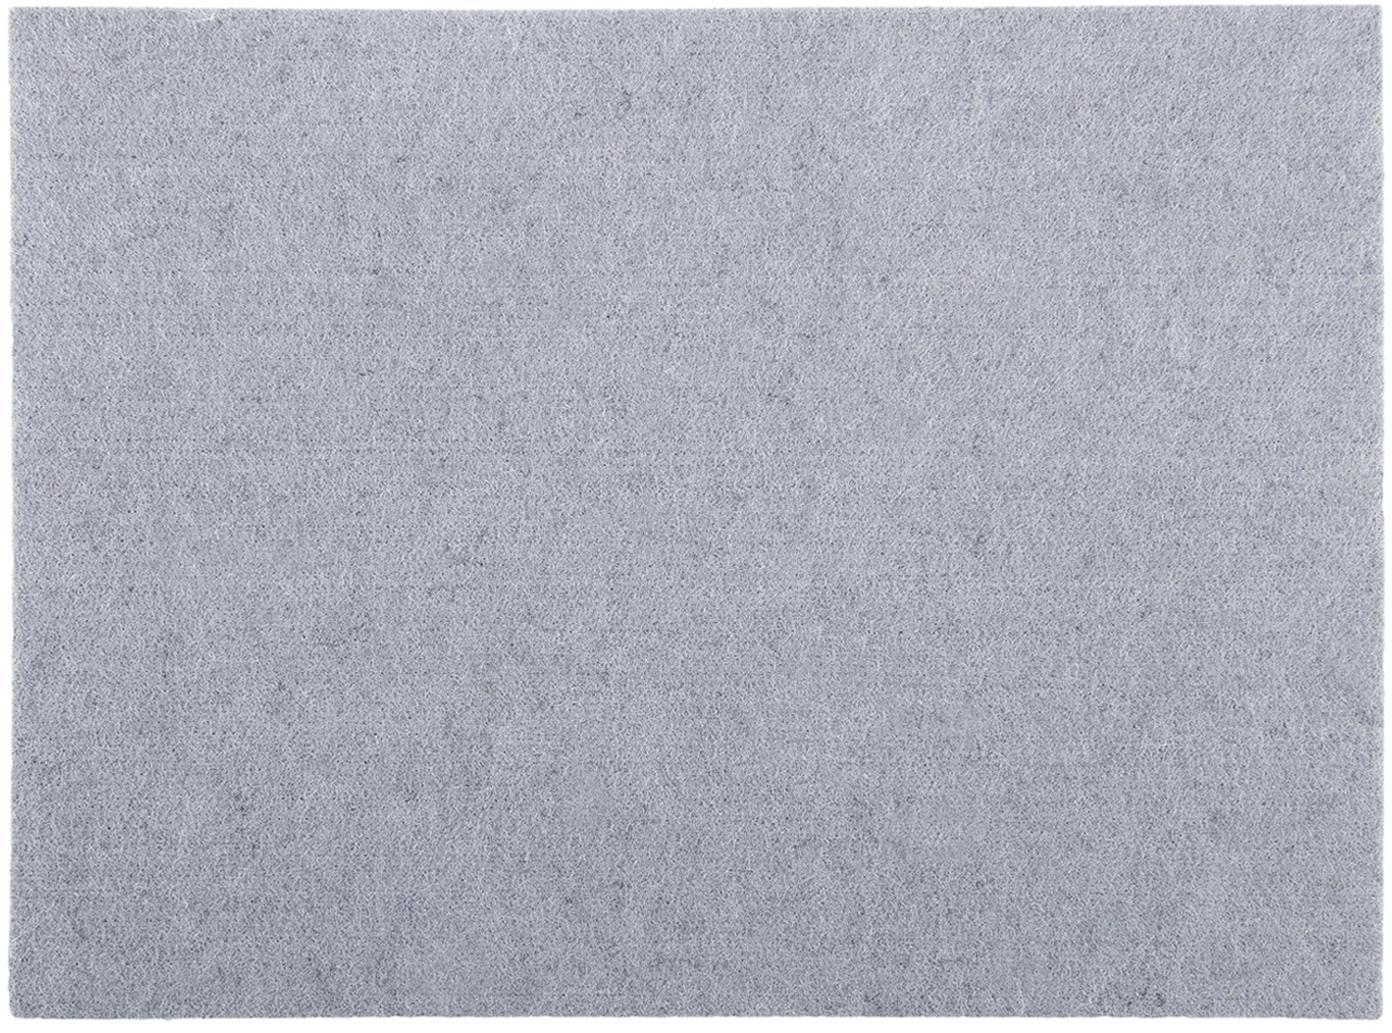 Tischsets Felto aus Filz, 2 Stück, Filz (Polyester), Grau, 33 x 45 cm